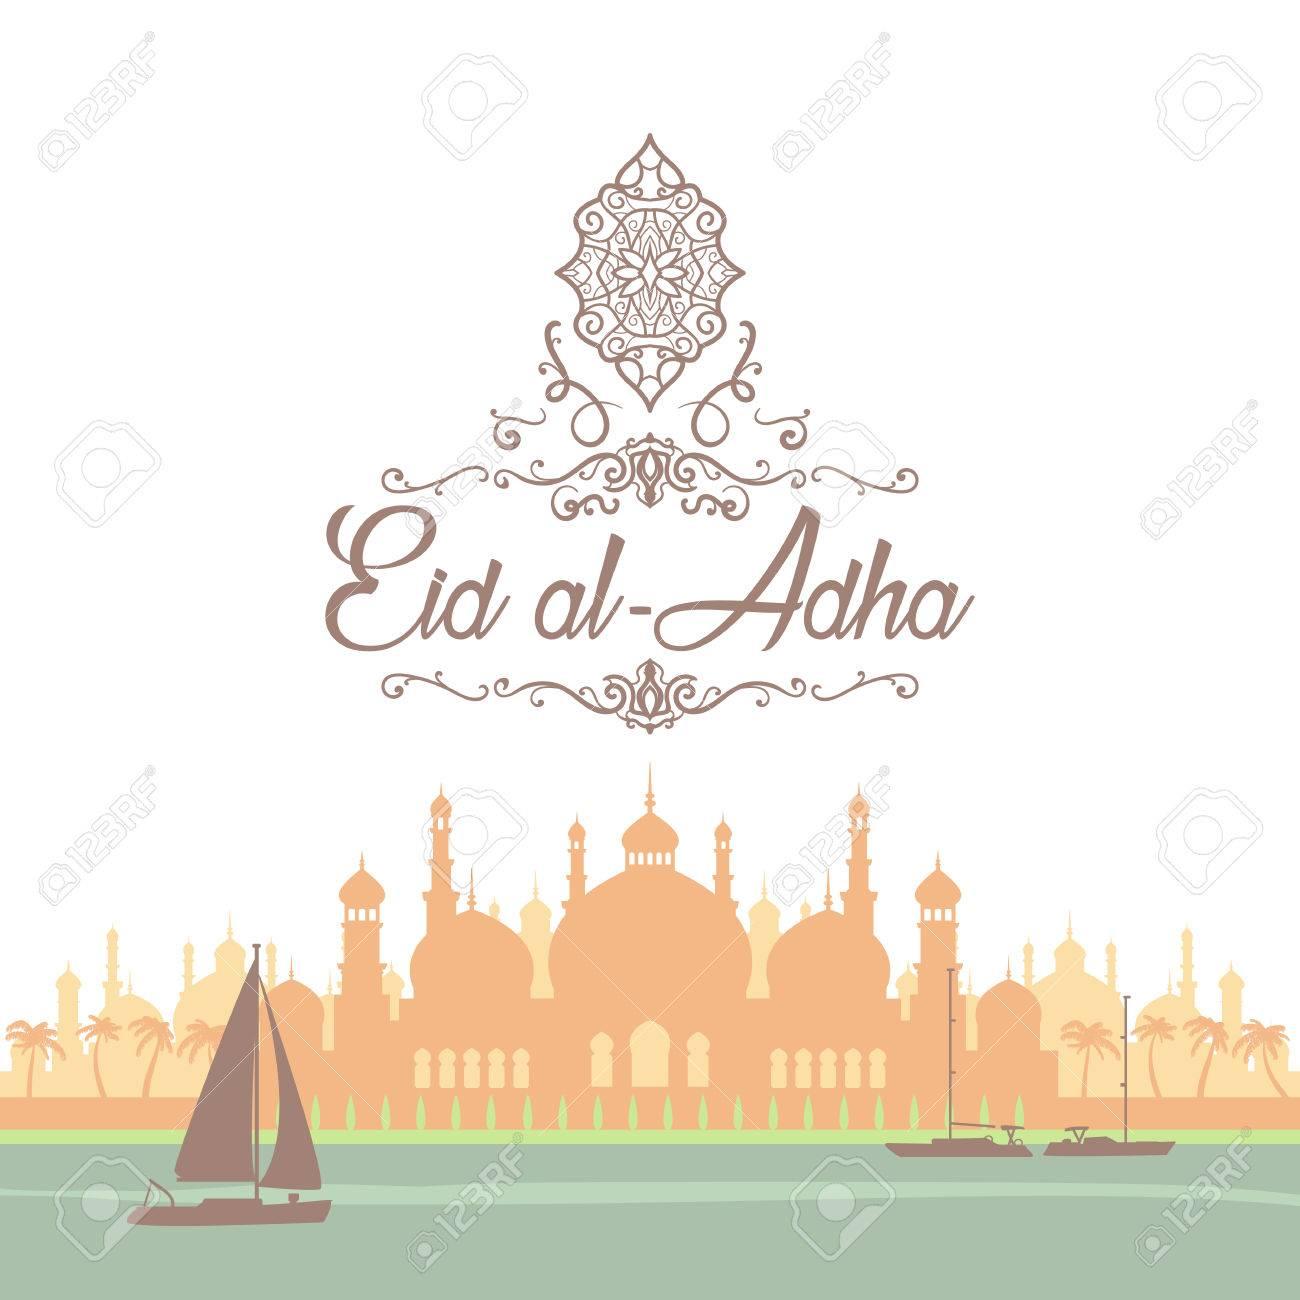 Eid greetings in arabic script an islamic greeting card for eid greetings in arabic script an islamic greeting card for eid al adha stock m4hsunfo